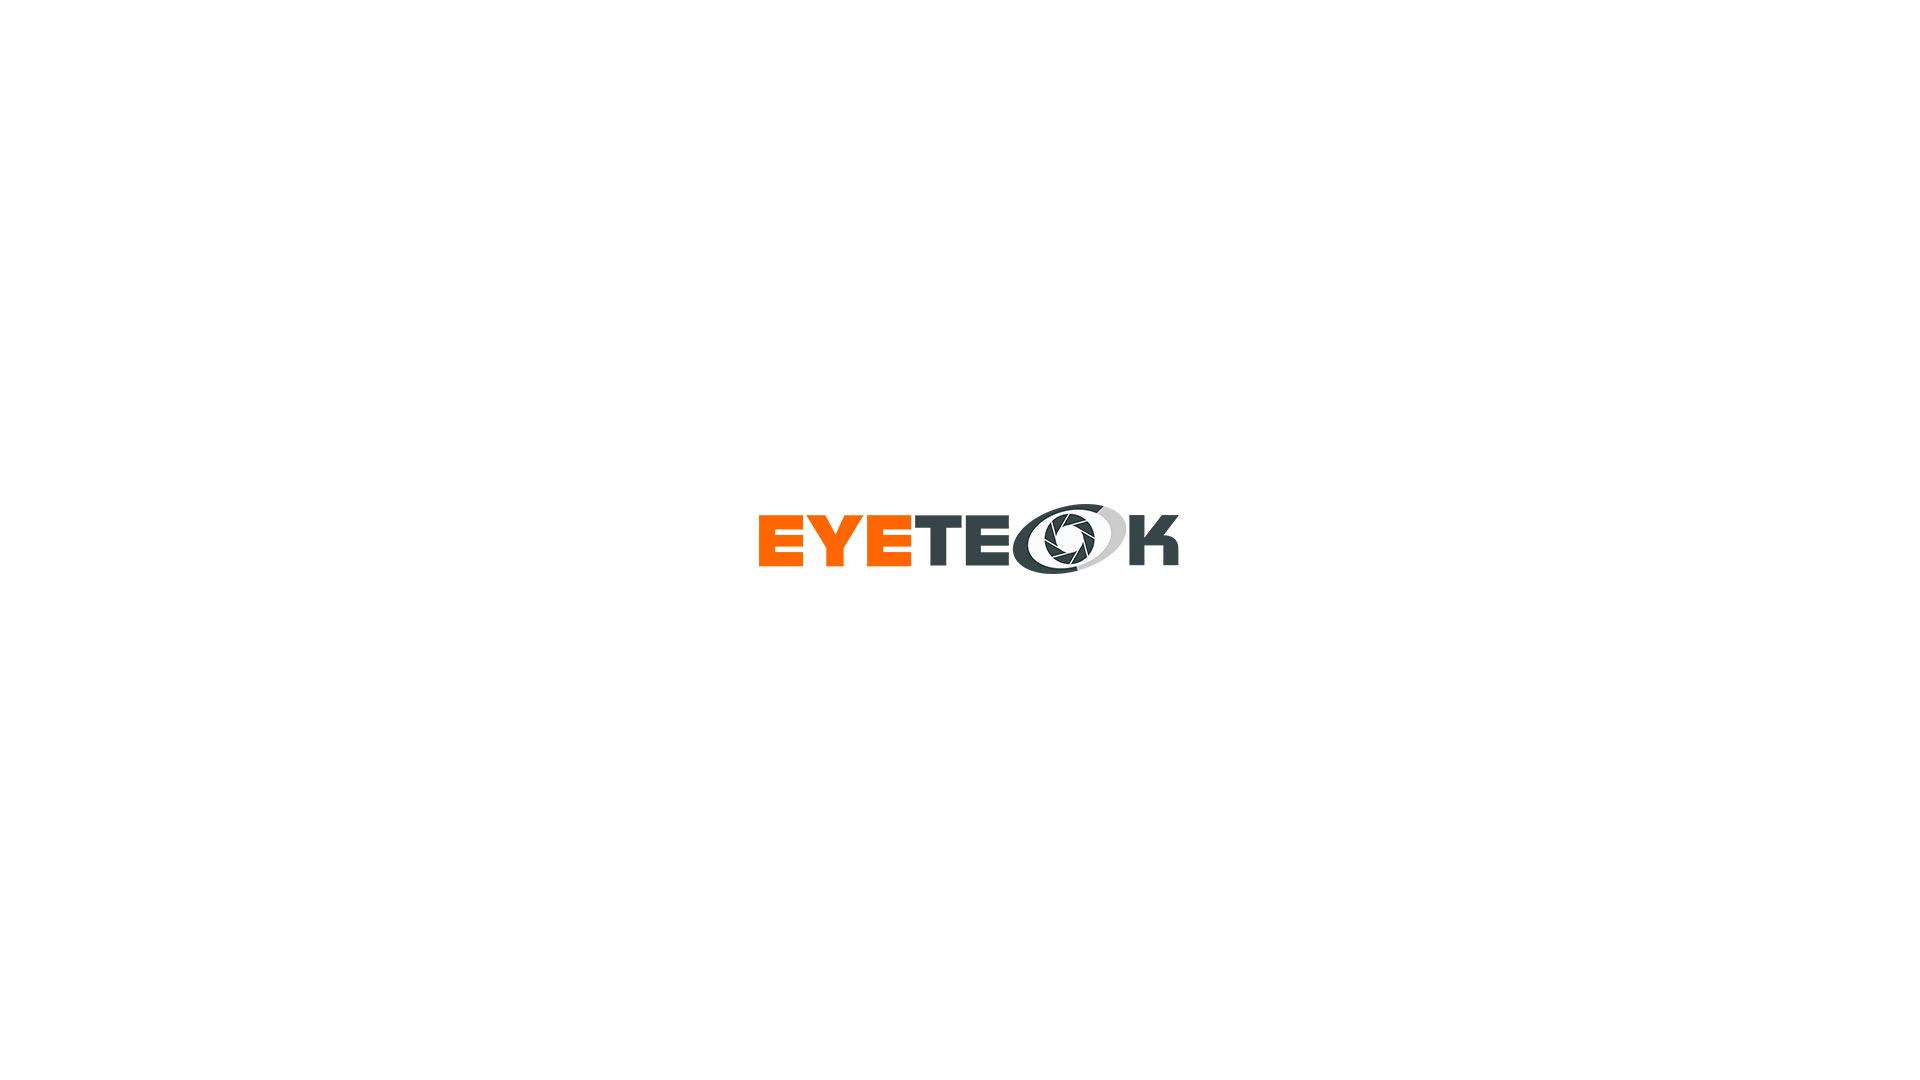 eye-teck-bourges